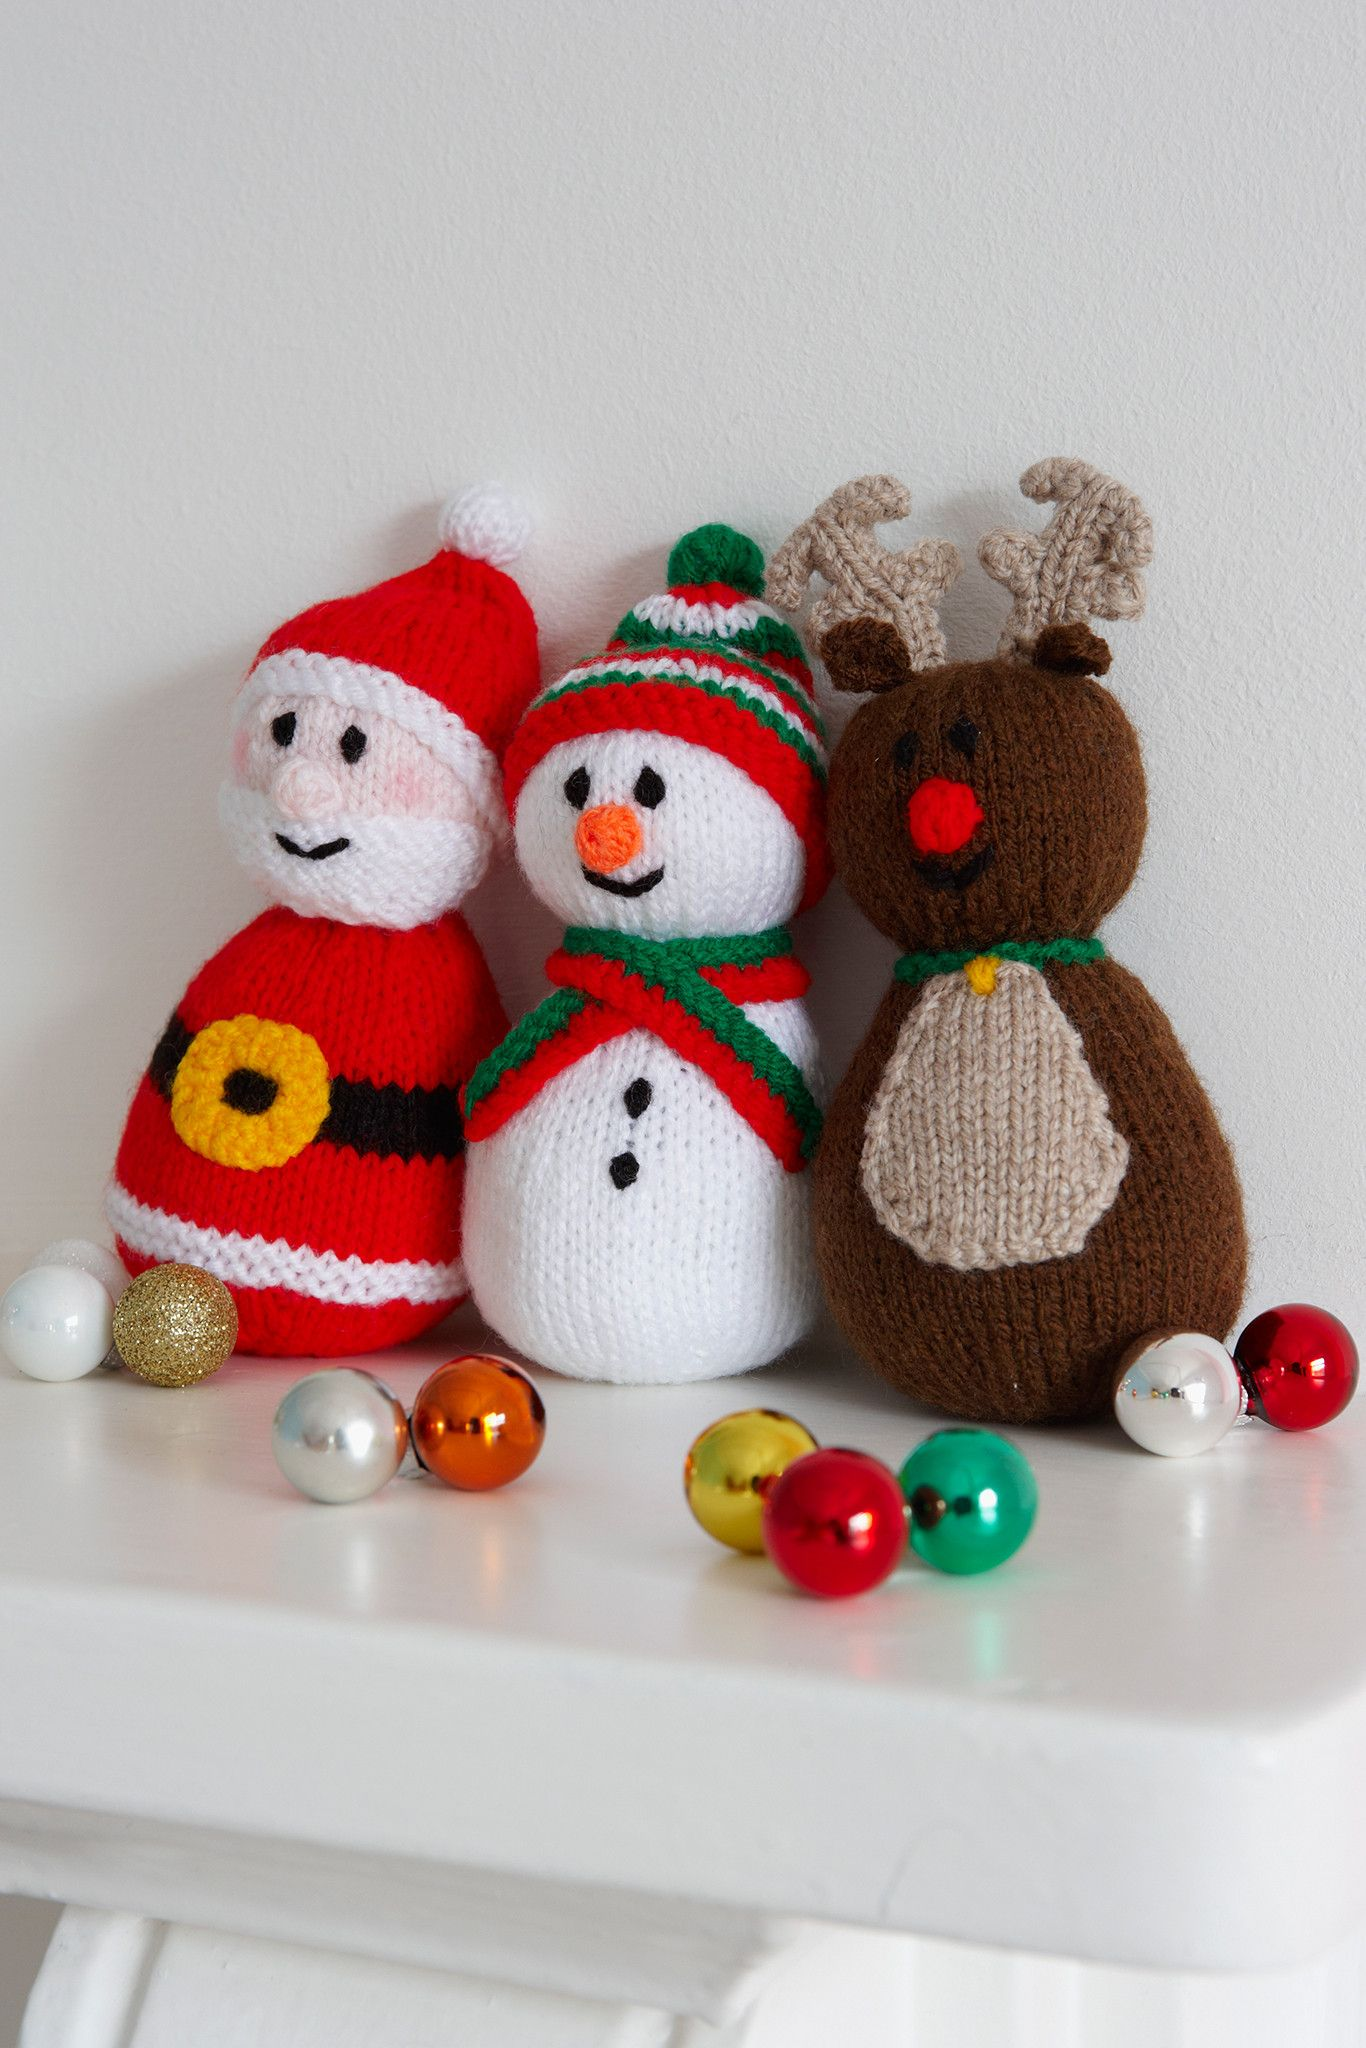 Christmas Toys Knitting Patterns | Snowman, Knit patterns and Santa